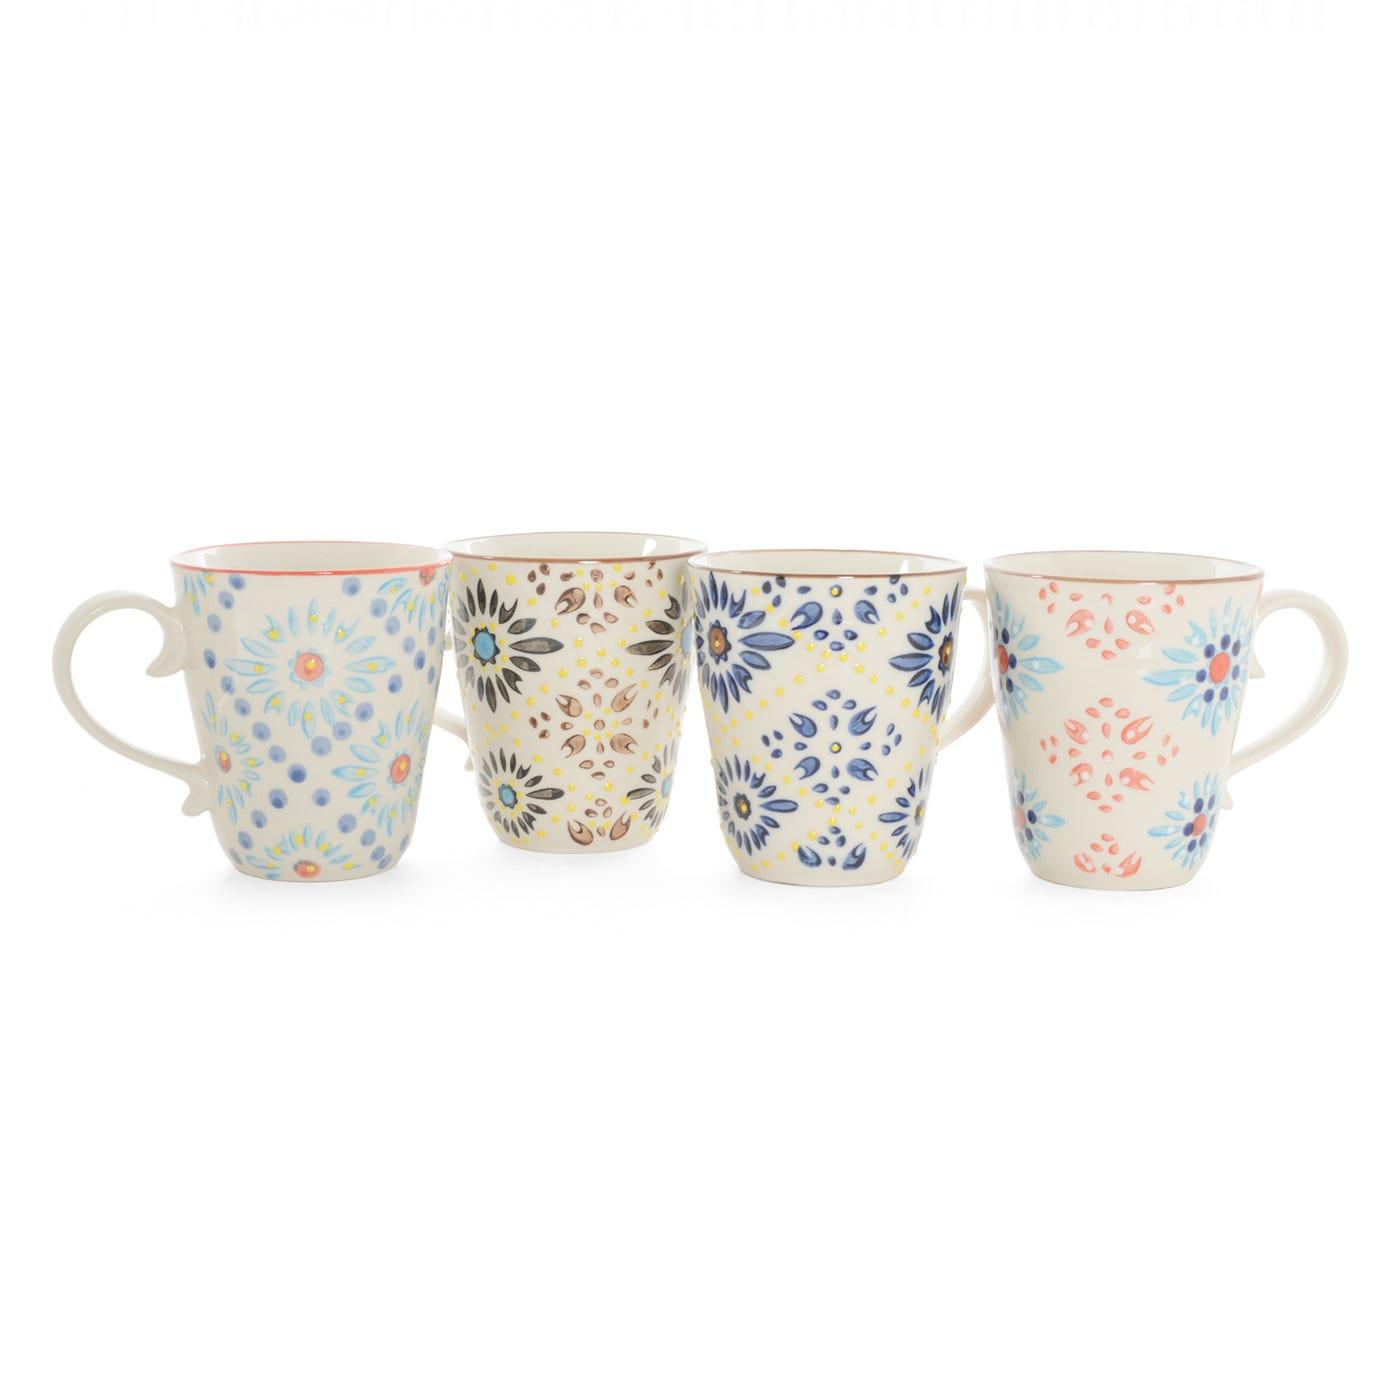 Mosaic Mugs Assorted Set Of 4